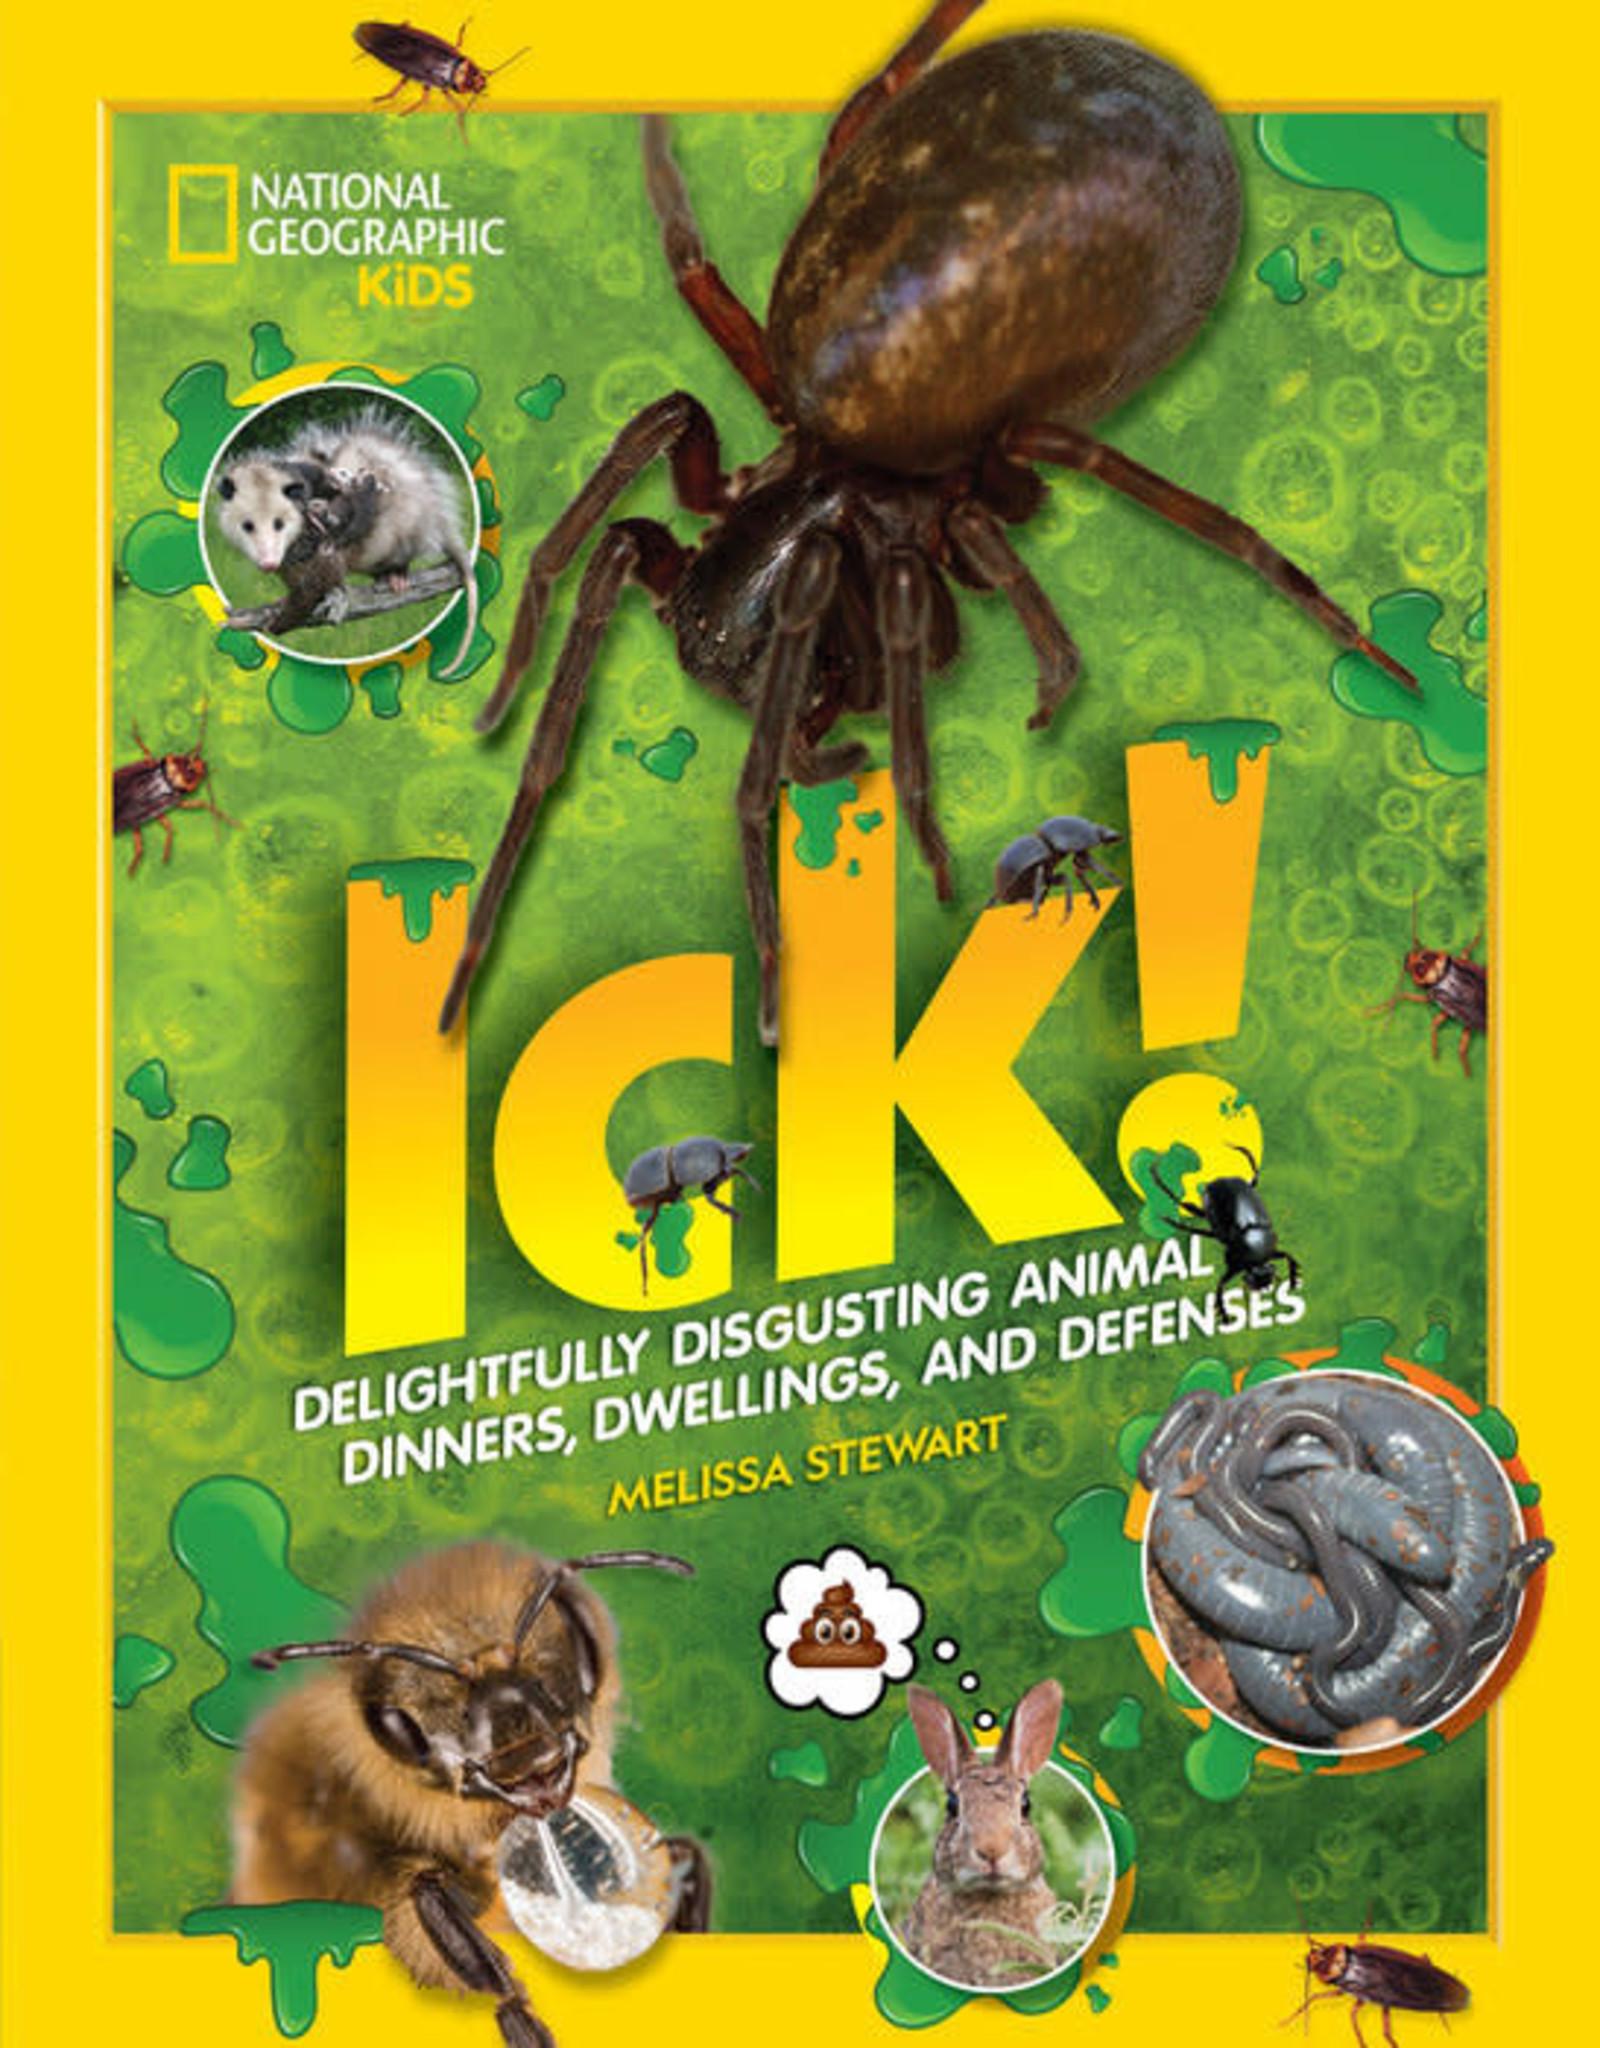 National Geographic Kids (NGK) NGK Ick